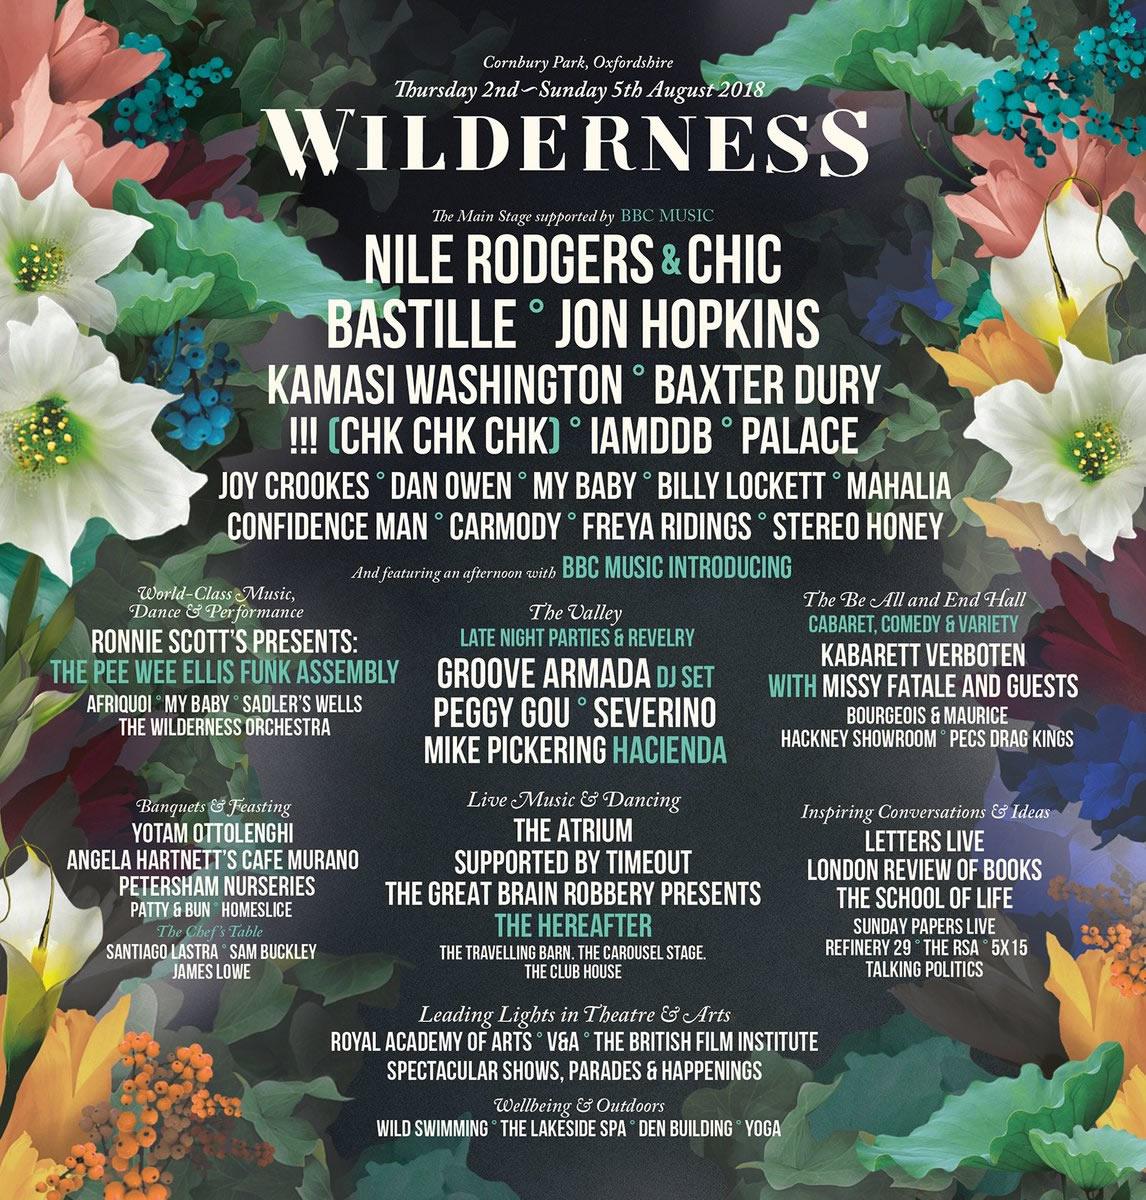 Wilderness lineup poster